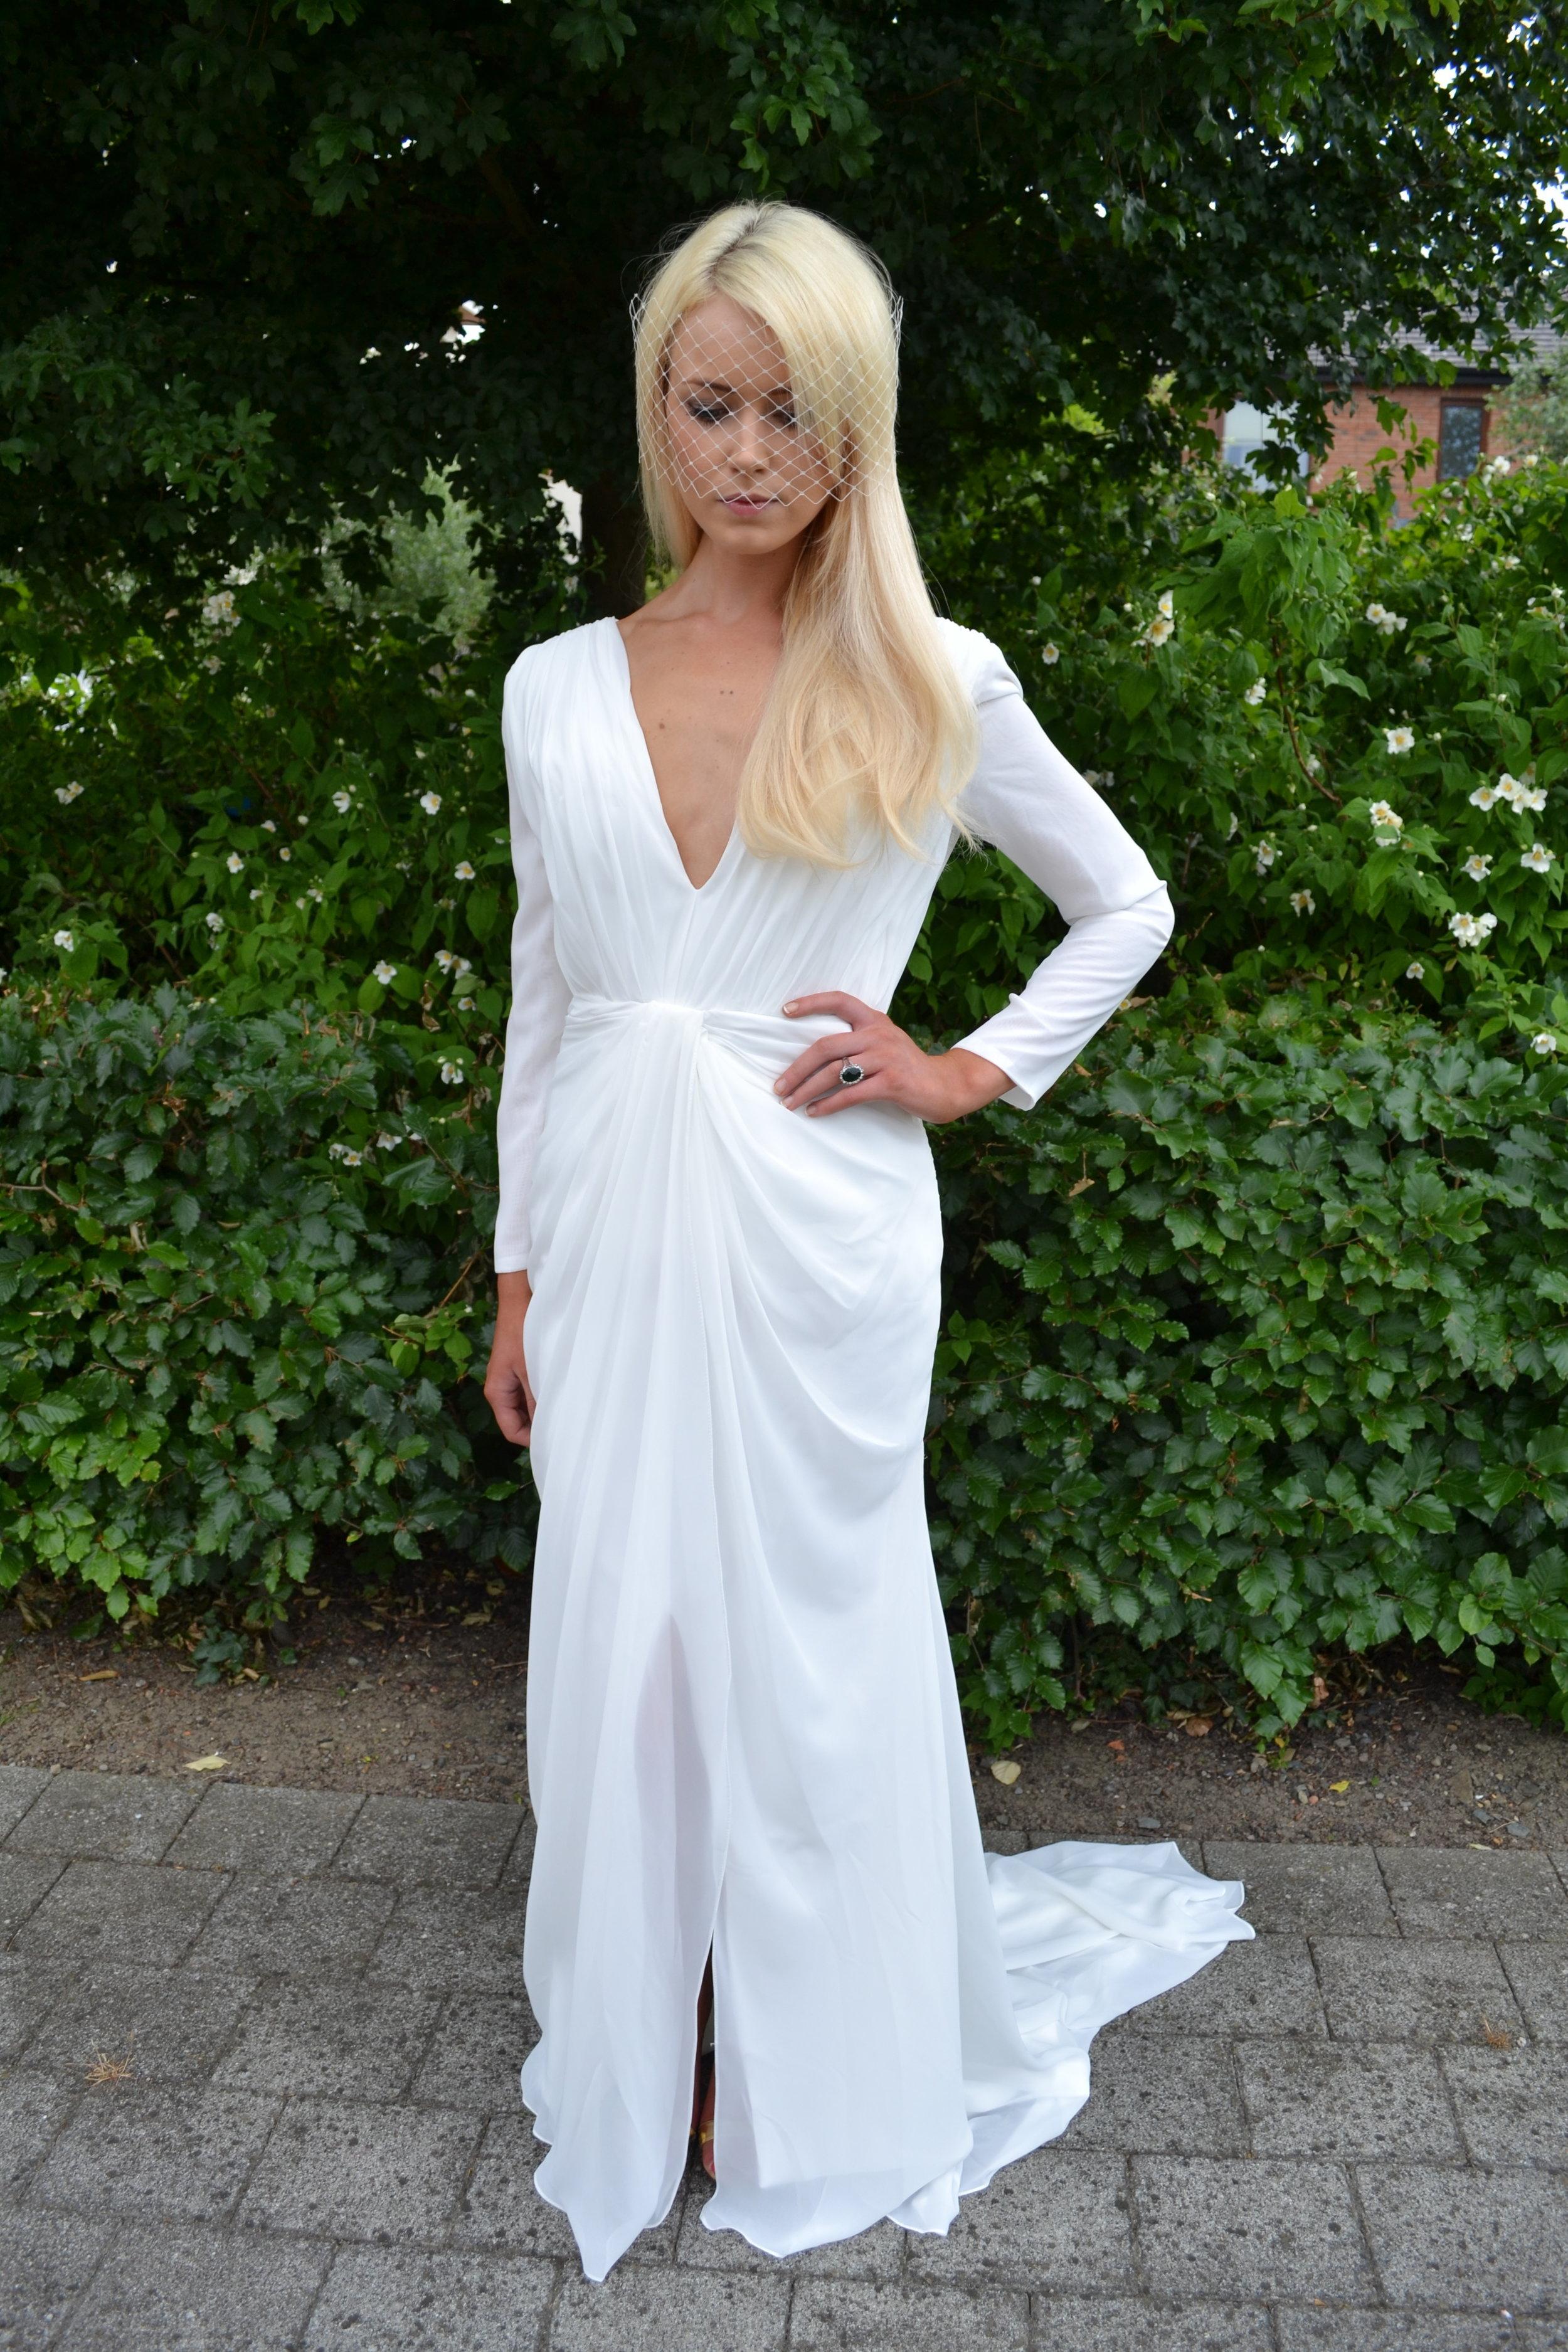 white bridal gown TheodoraJames,.JPG